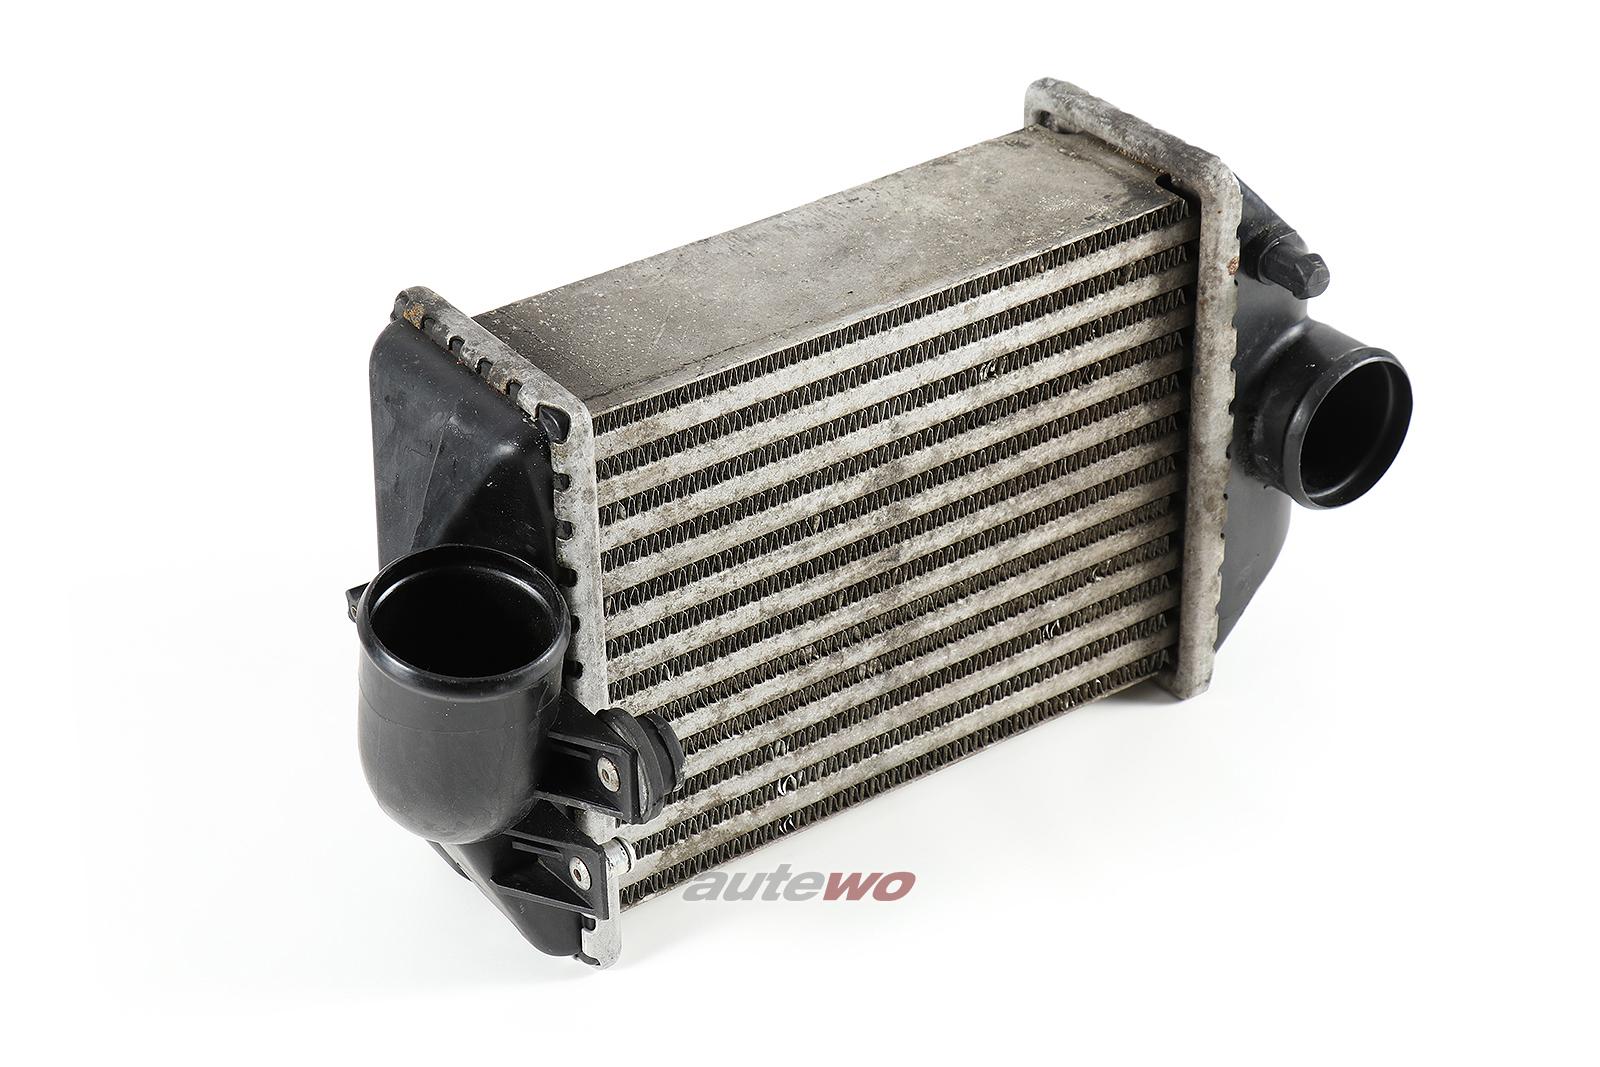 078145805F 078145805L/N Audi S4 B5/A6 4B 2.7l Biturbo Ladeluftkühler Links